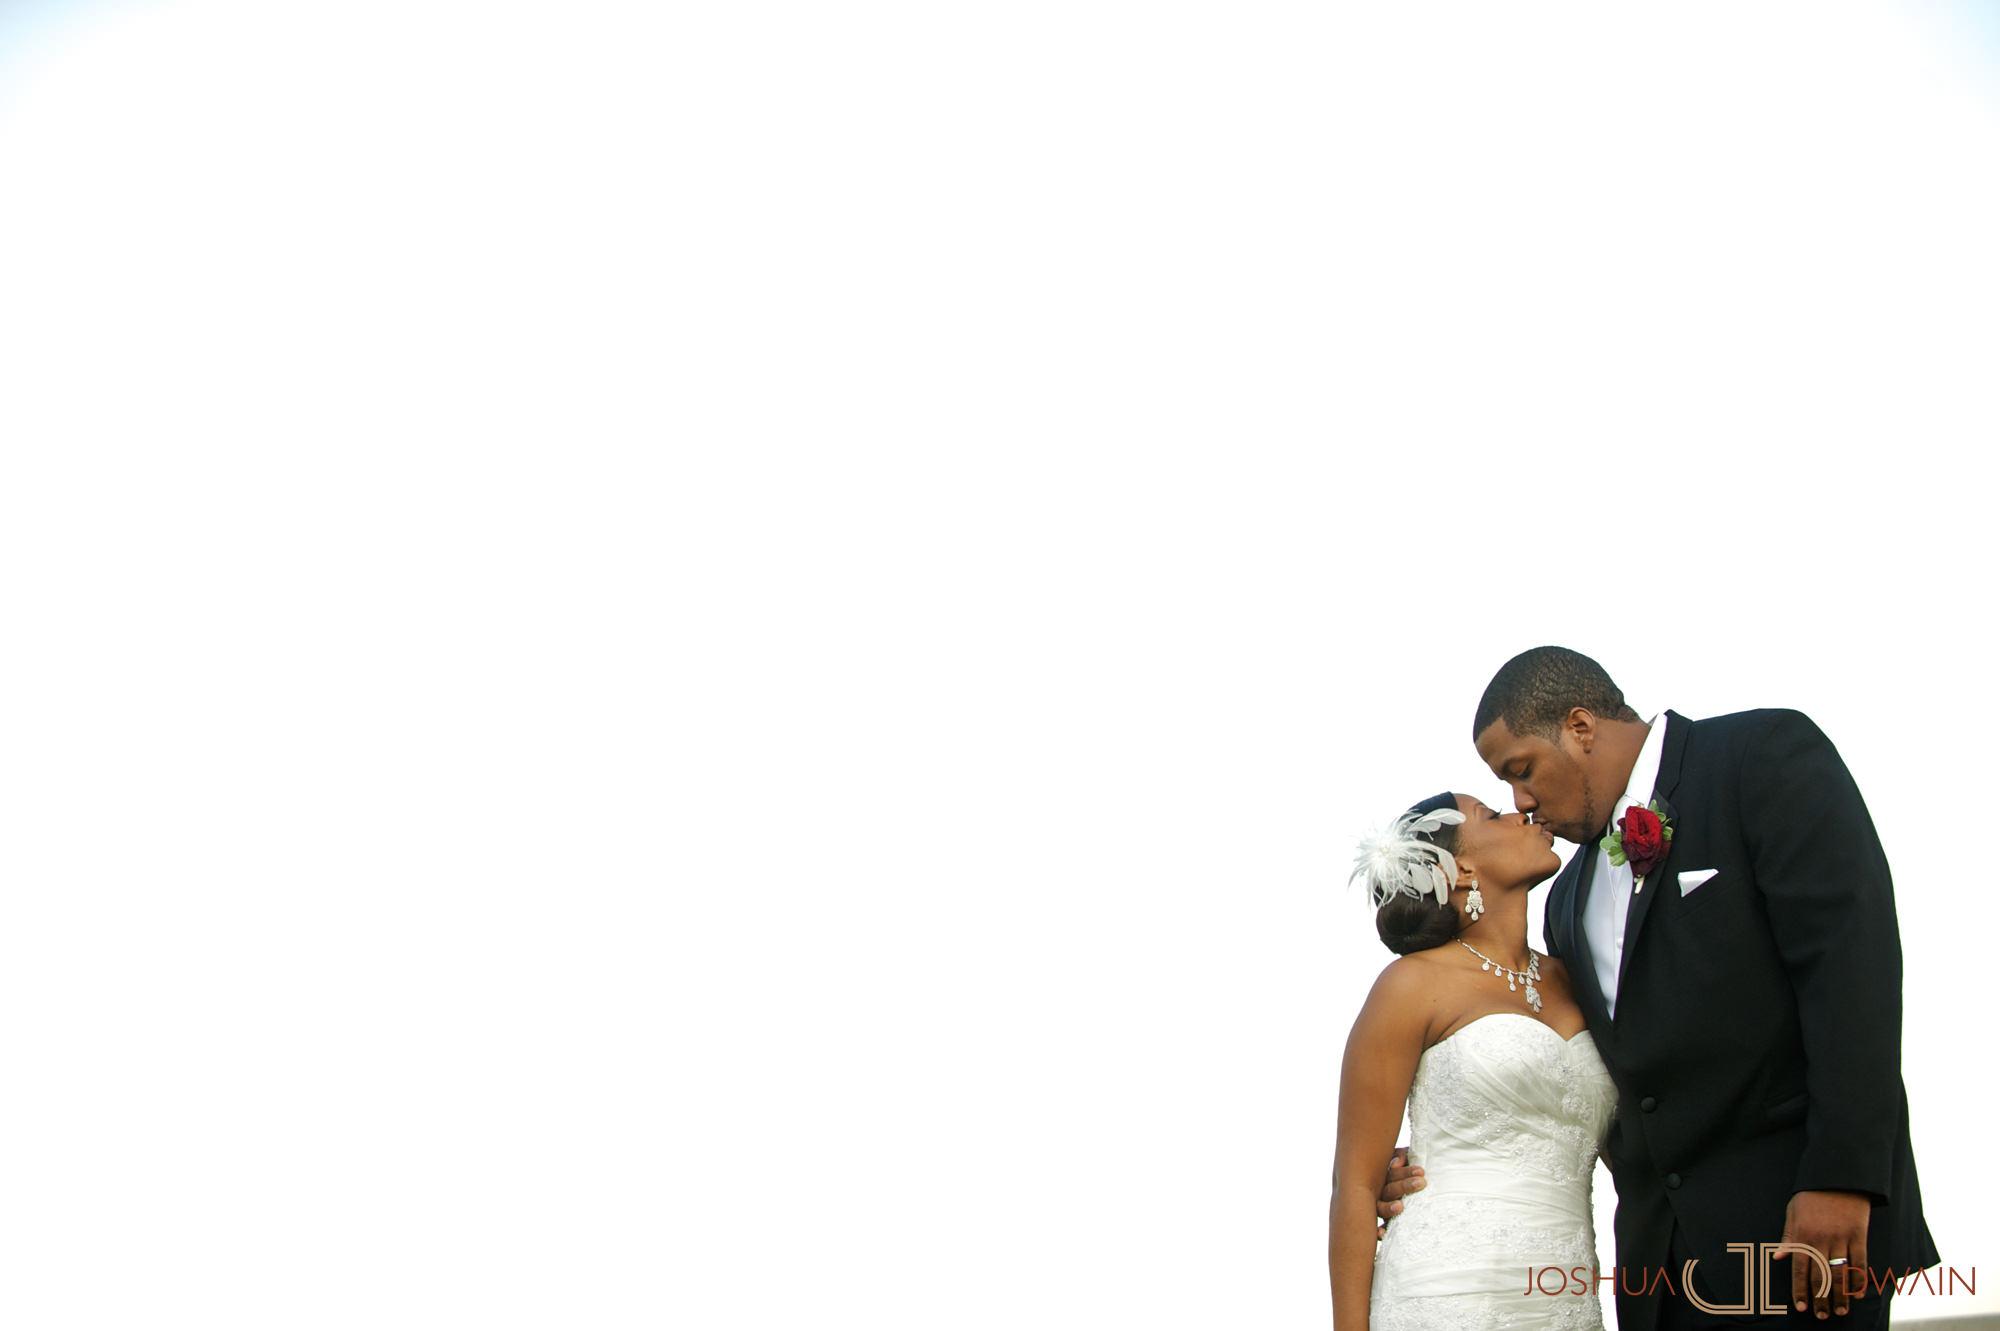 natifia-don-023-greentree-country-clubnew-rochelle-new-york-wedding-photographer-joshua-dwain-20101023_dn_0991